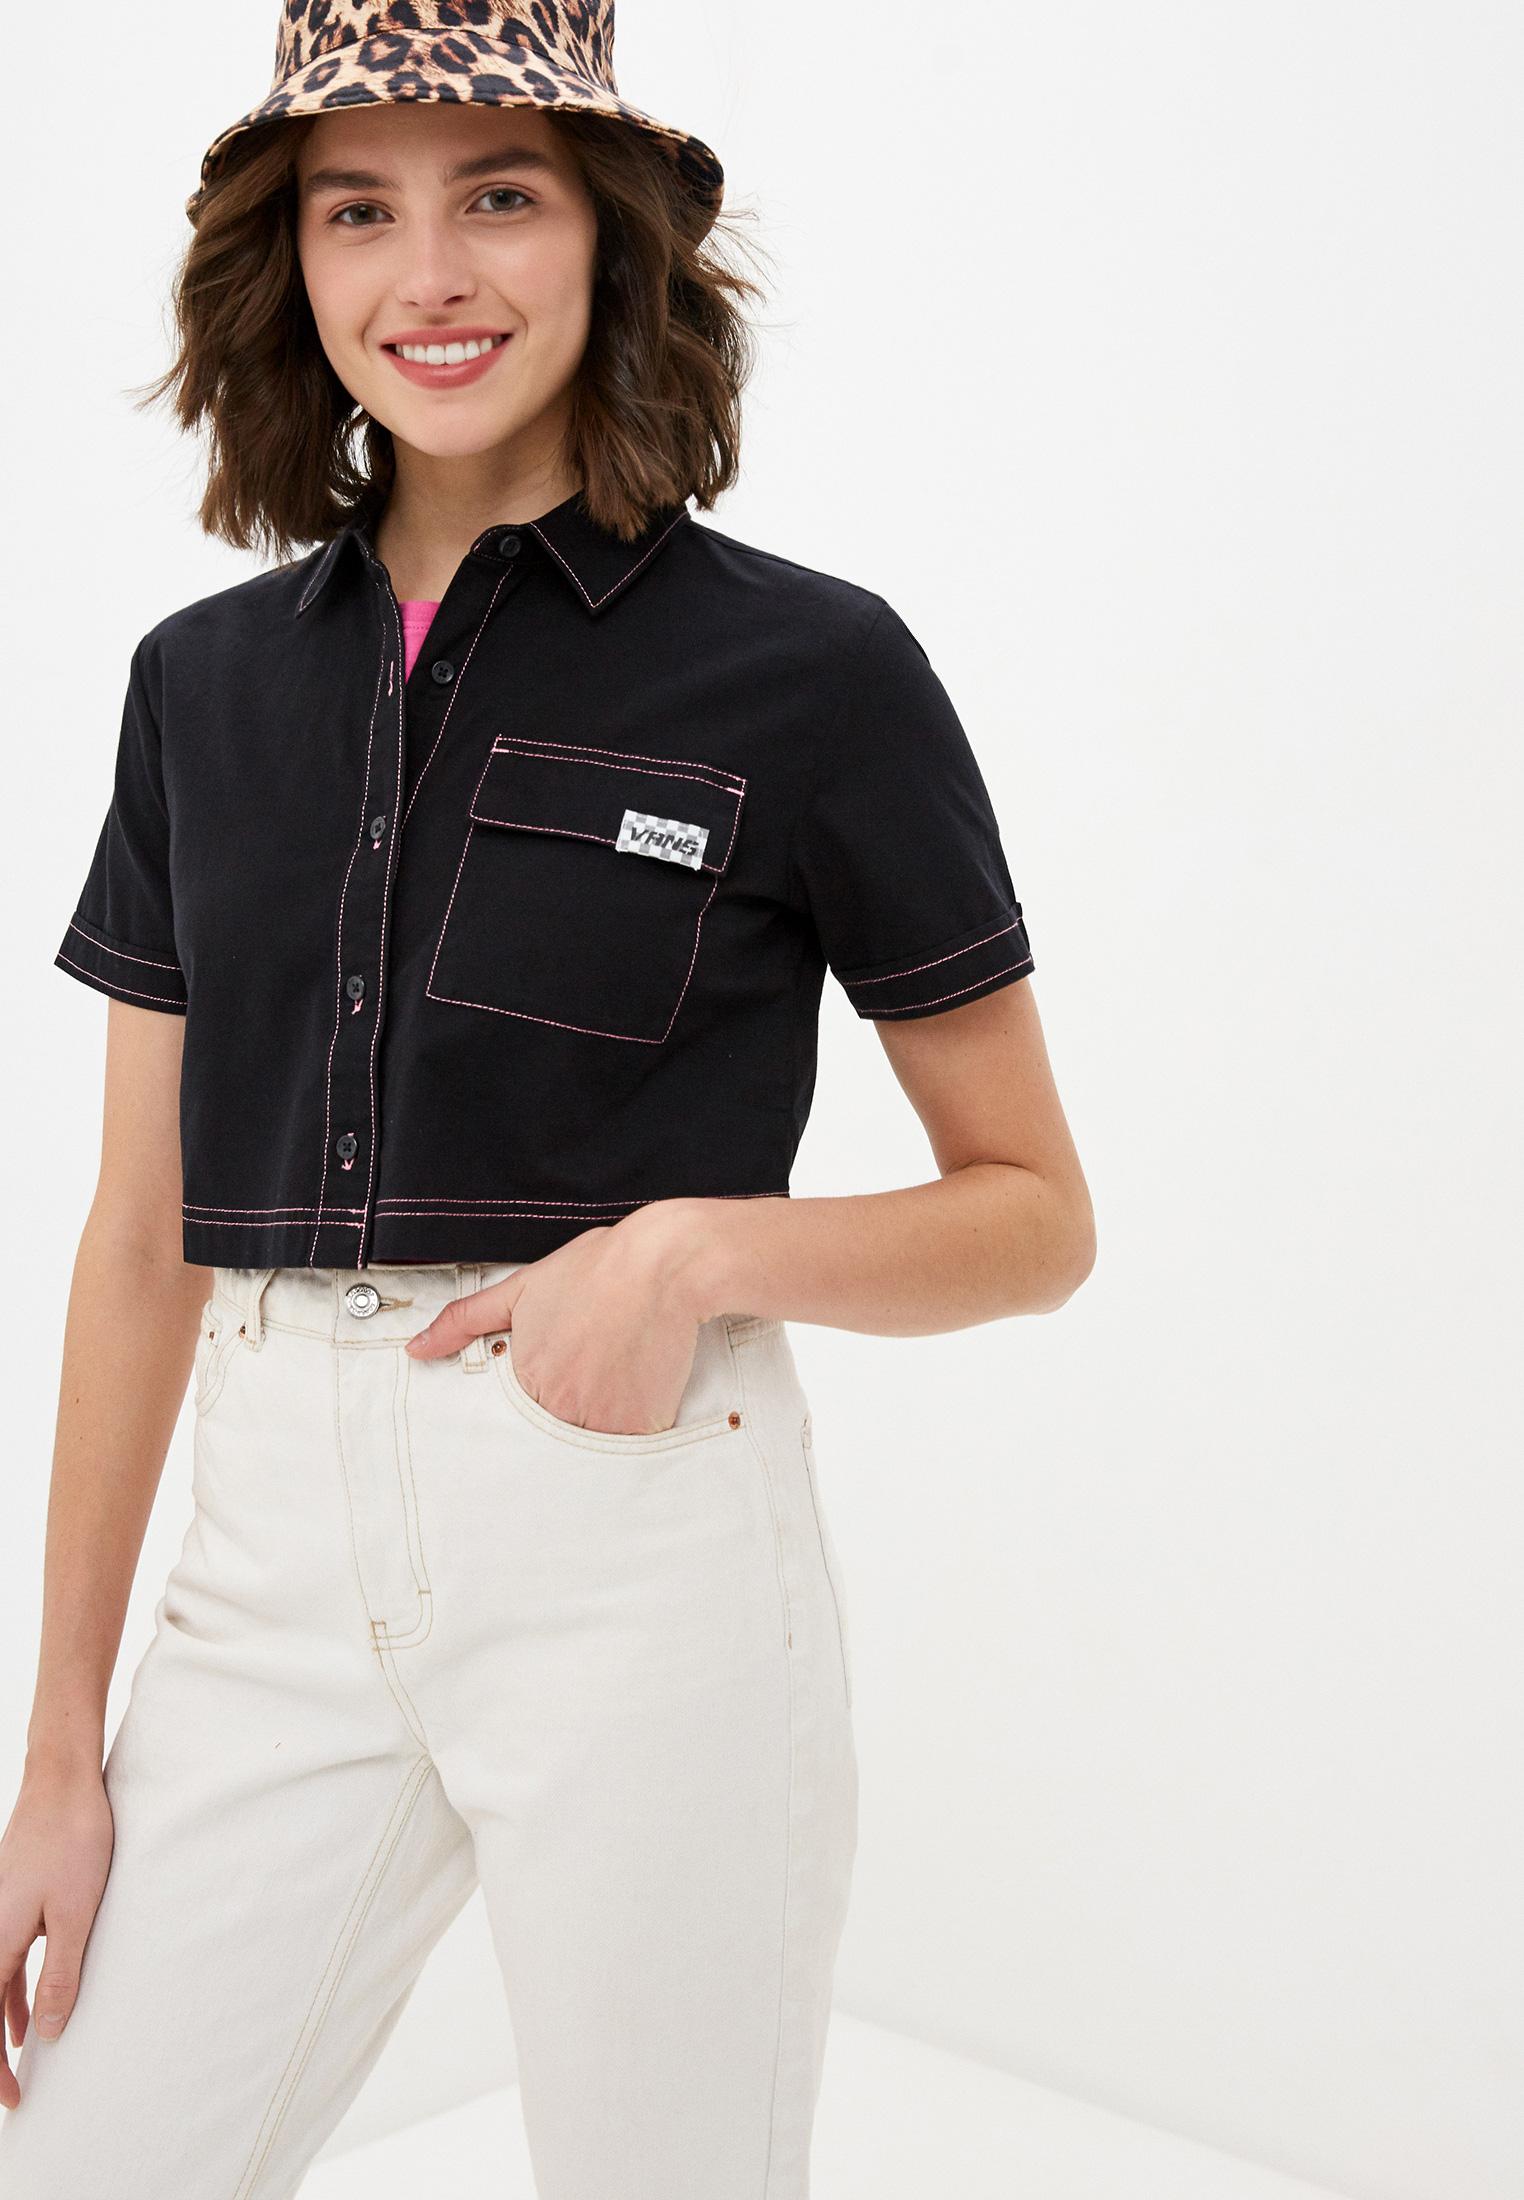 Рубашка с коротким рукавом VANS VA4MVGBLK: изображение 1